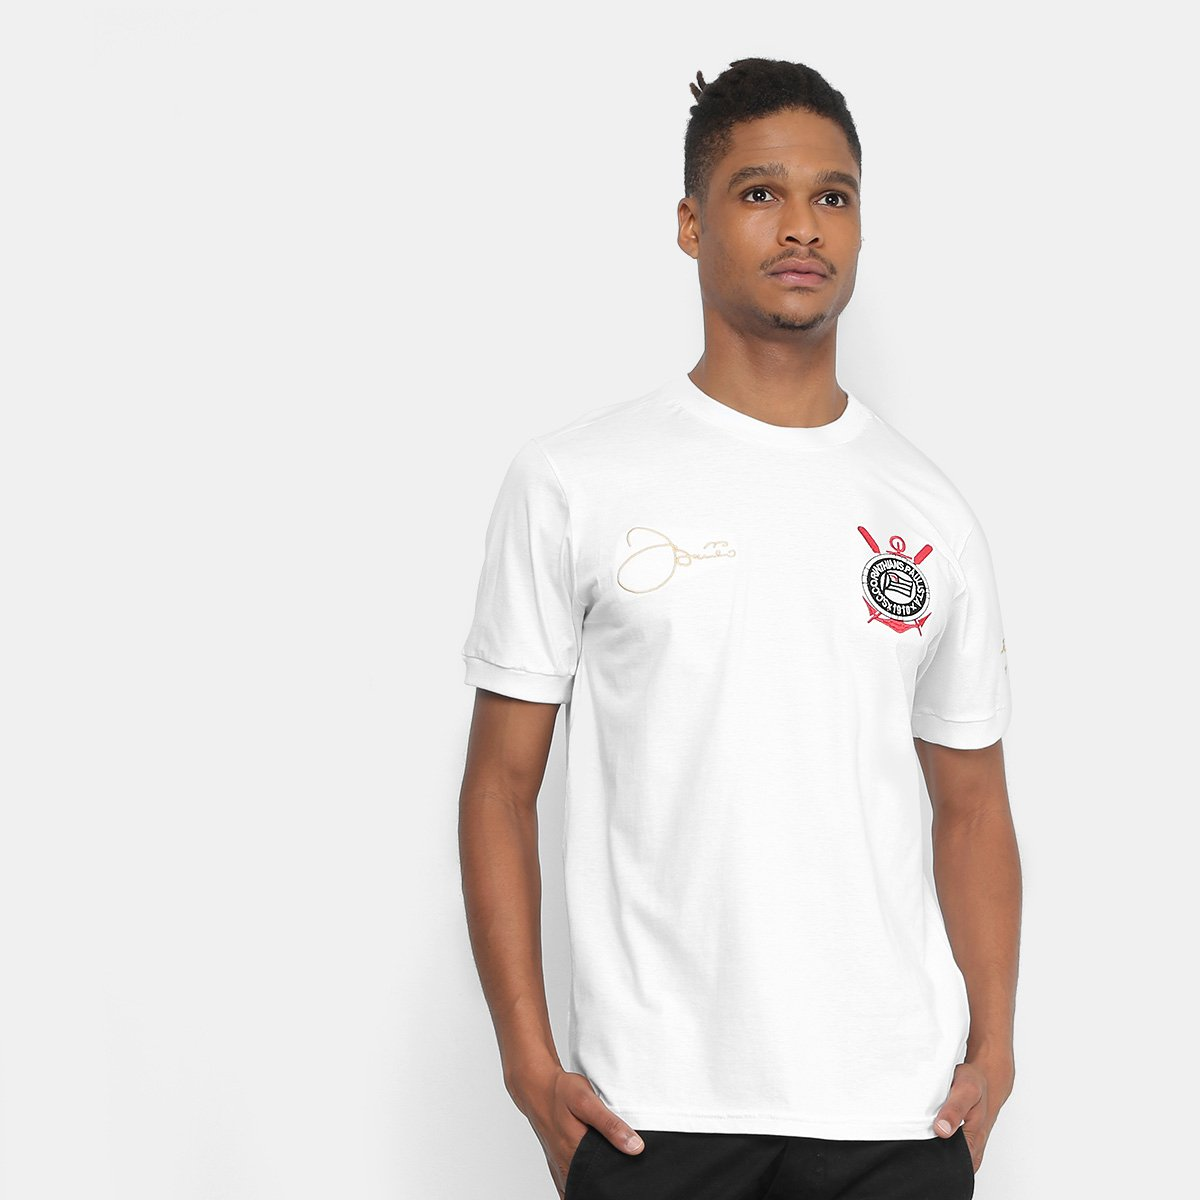 Camiseta Corinthians Basilio Réplica 1979 0333a2d1208a1